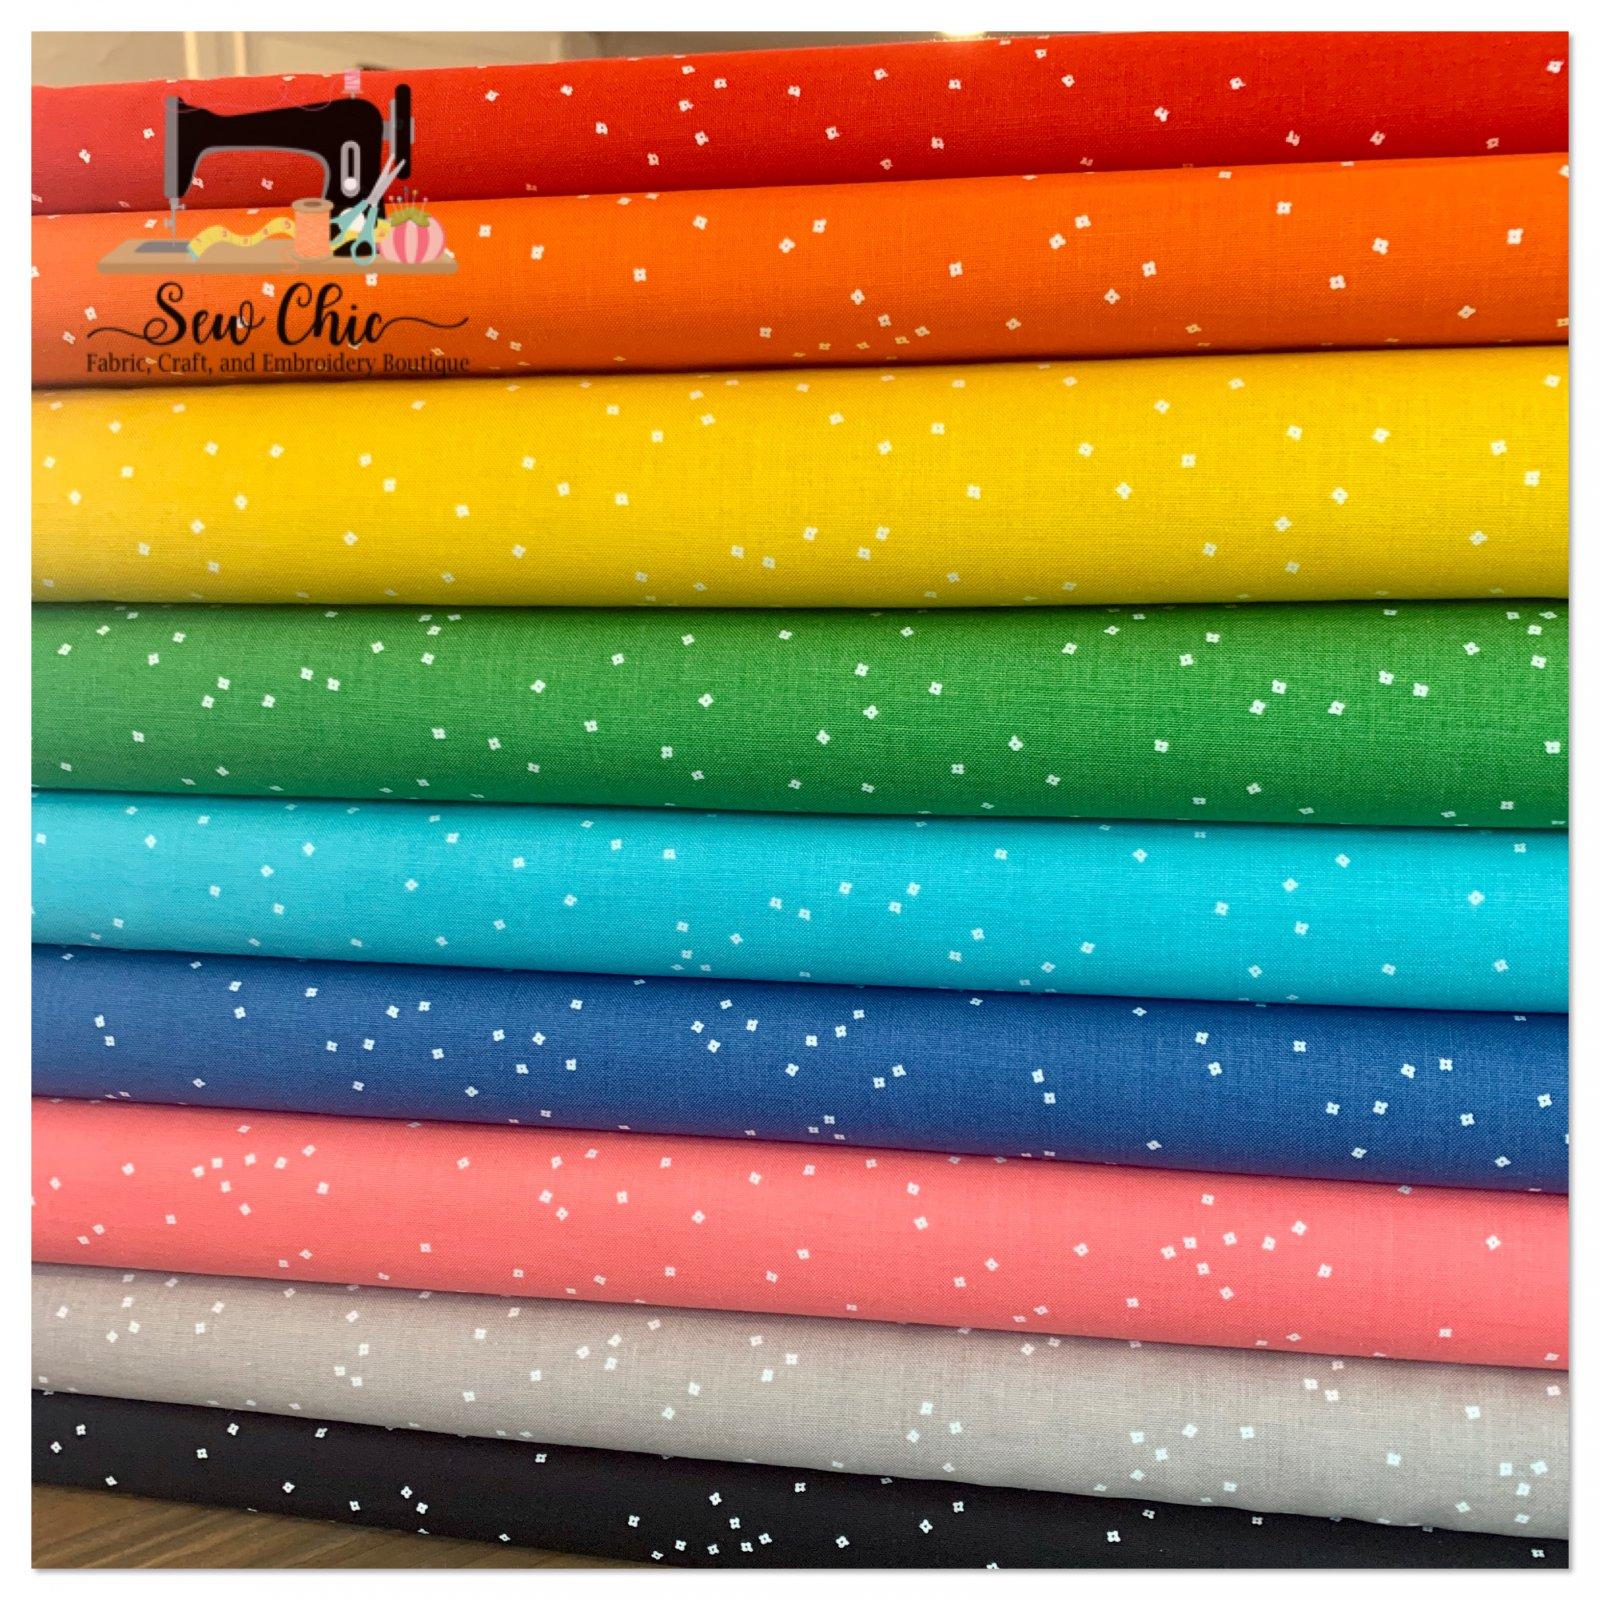 Blossom Rainbow Fat Quarter Bundle 9 fat quarters